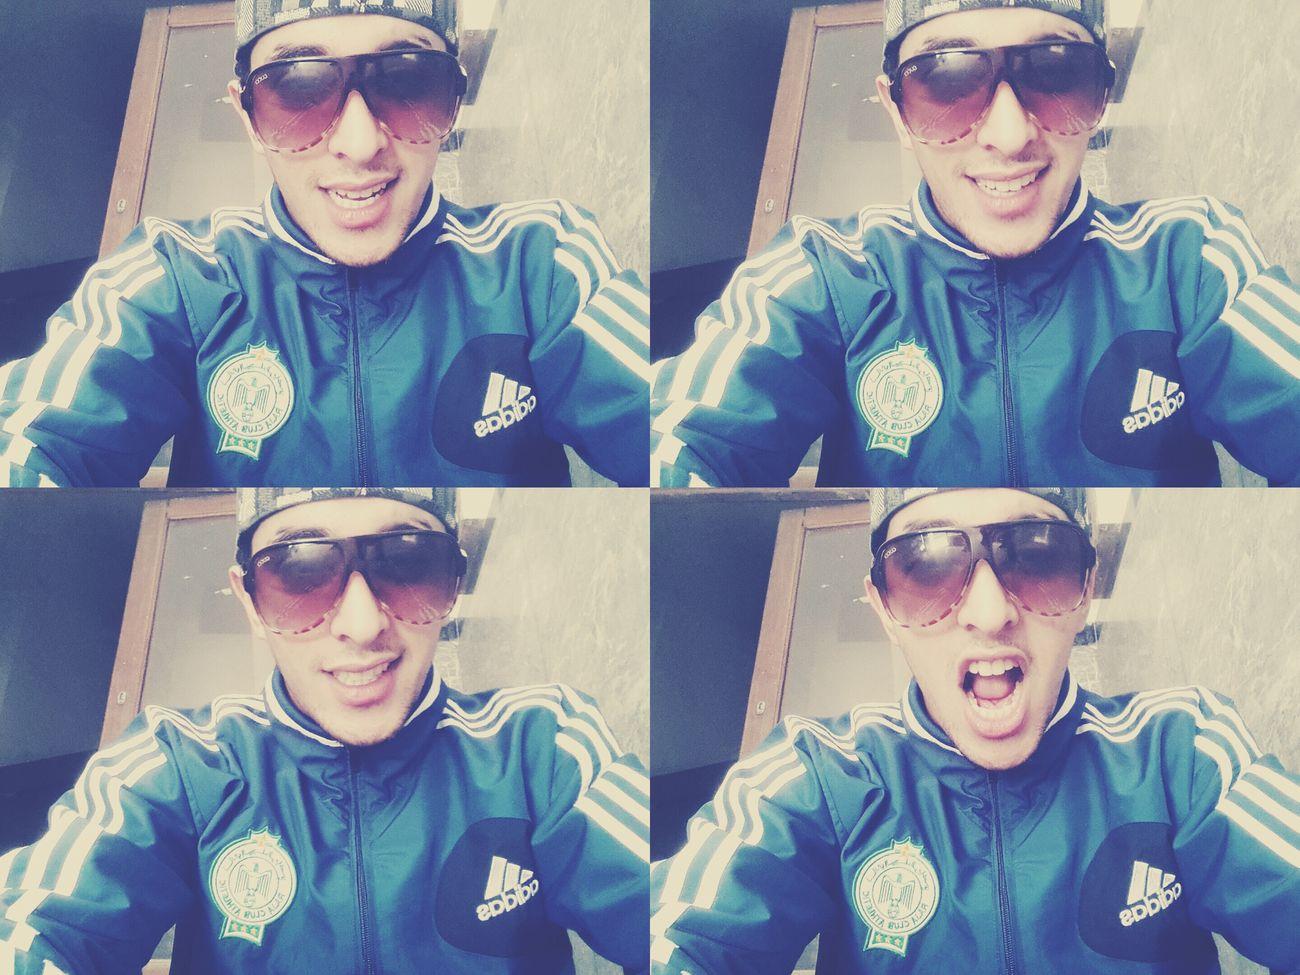 Good Morning No Love Badboy Goodlips Raja Mondiale♥♡ Followforfollow Followback Follow4follow Like4like Likeforlike